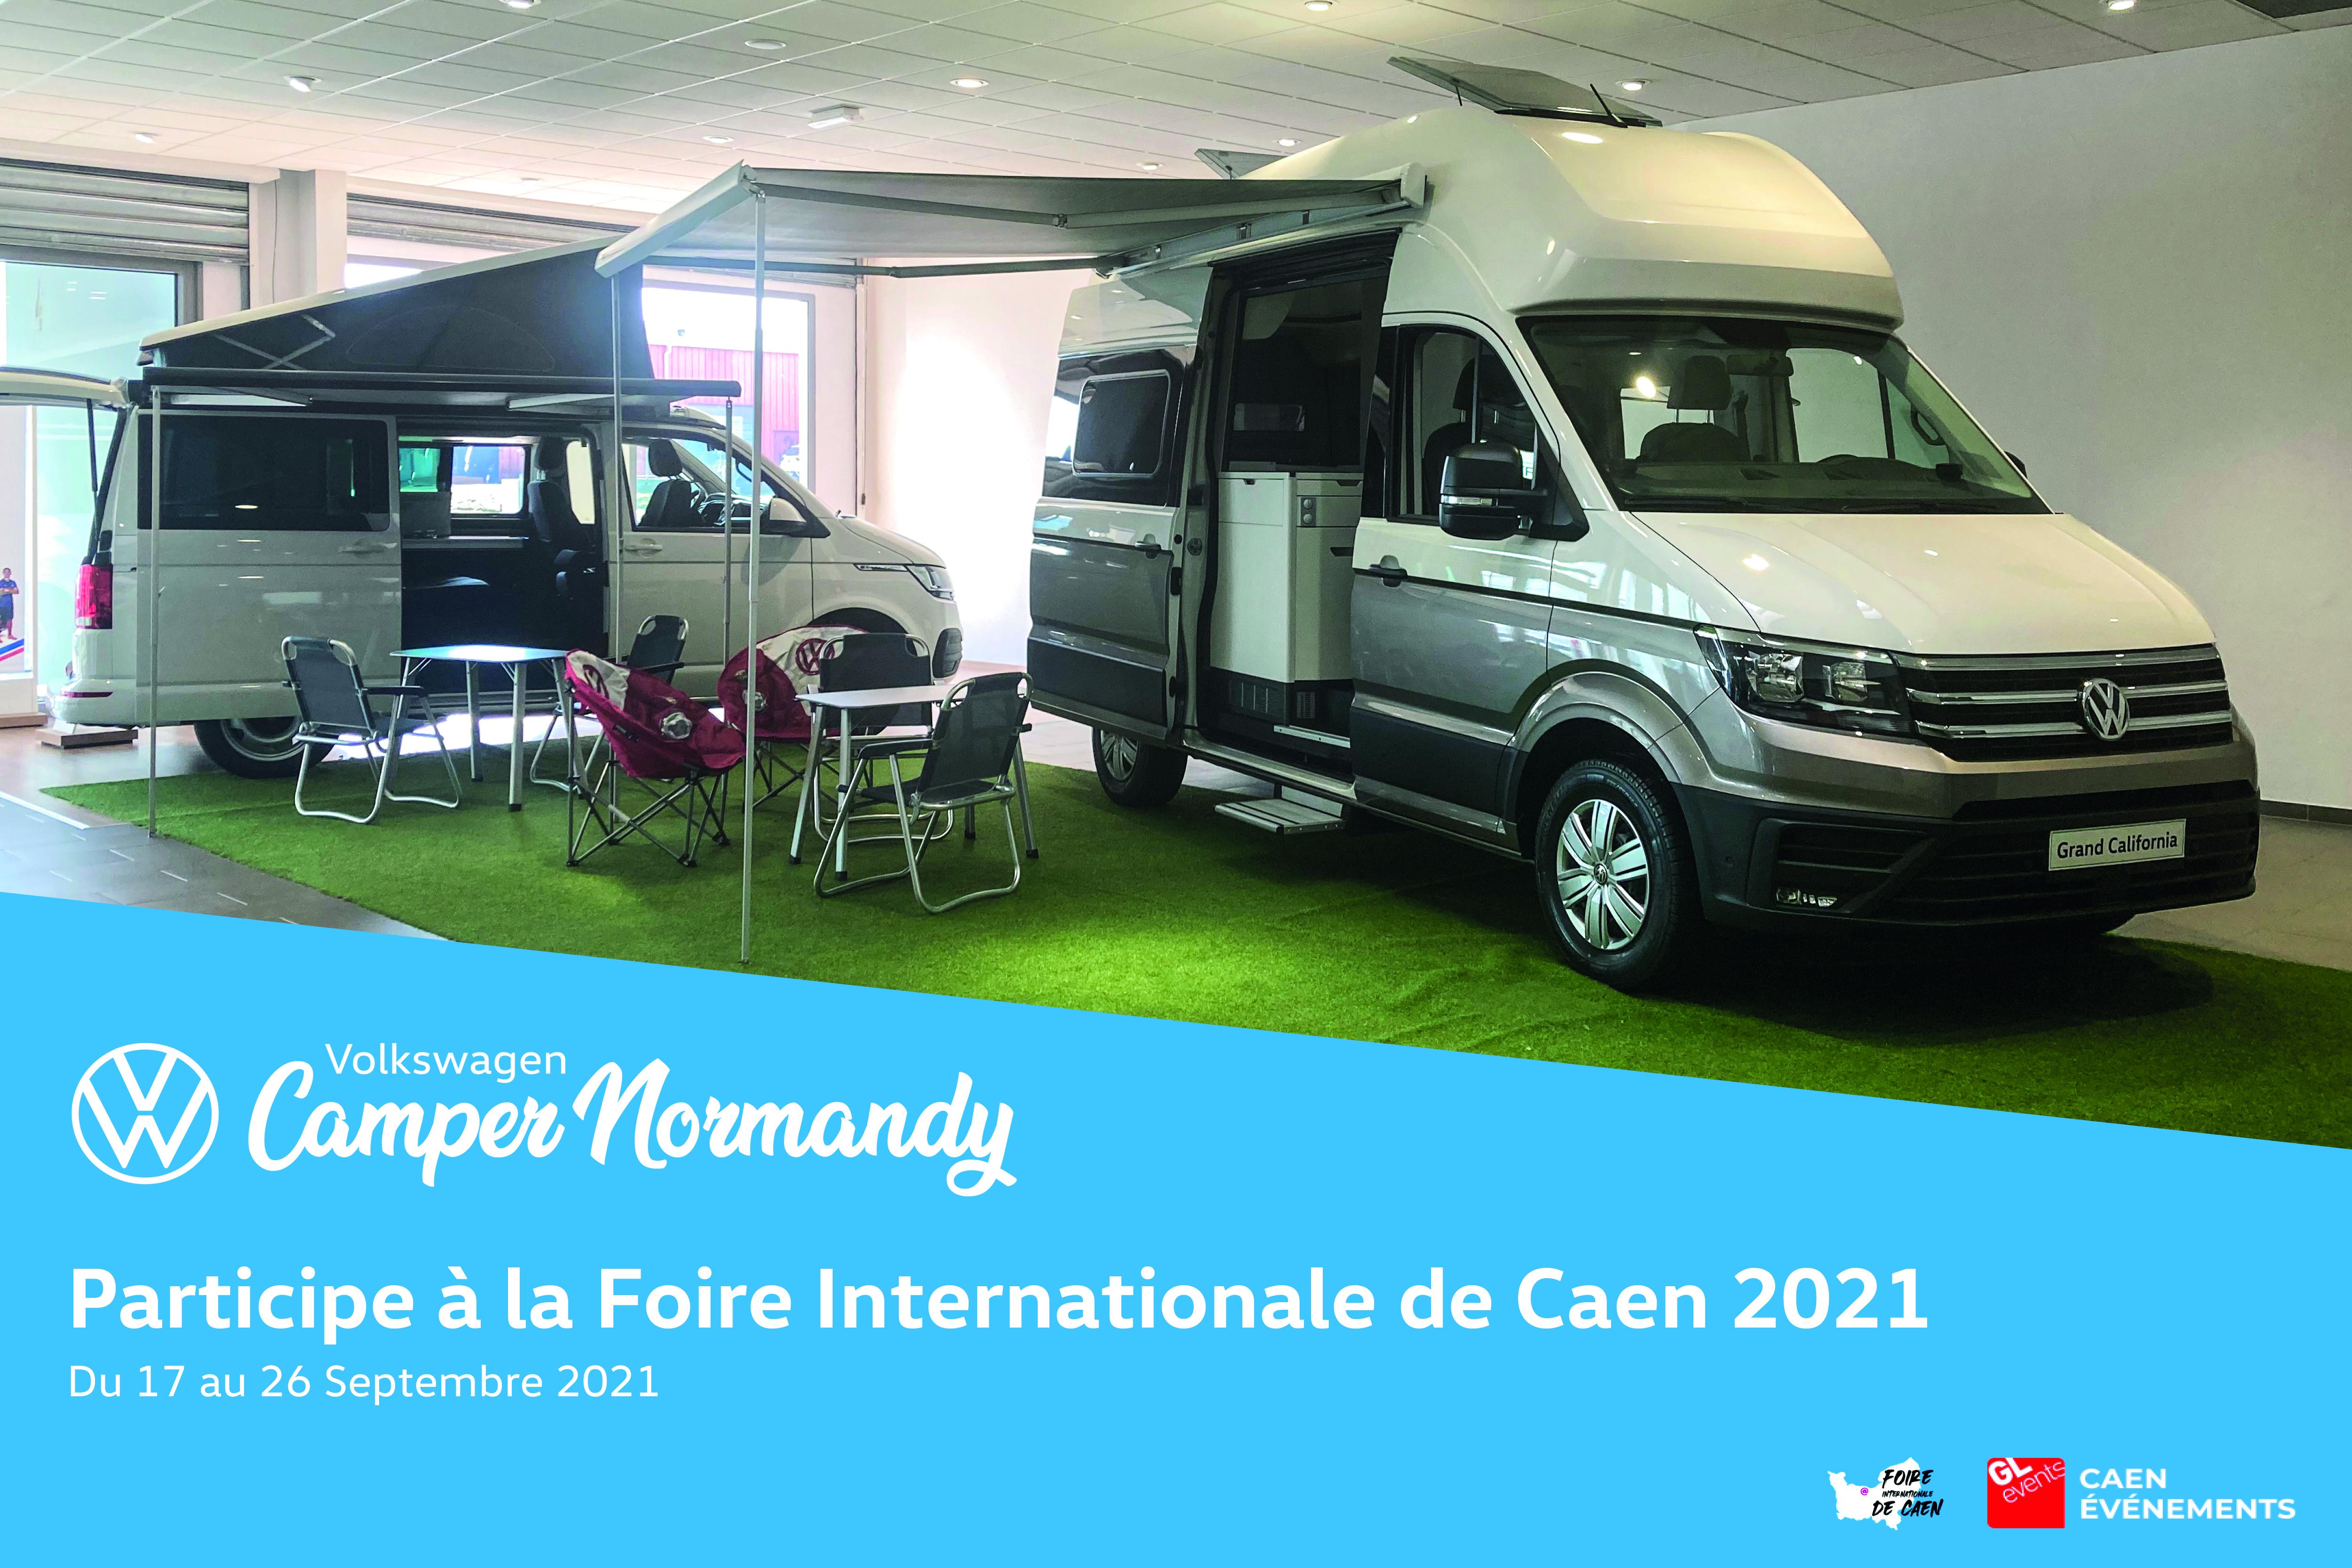 Volkswagen Camper Normandy s'invite à la Foire Internationale de Caen 2021